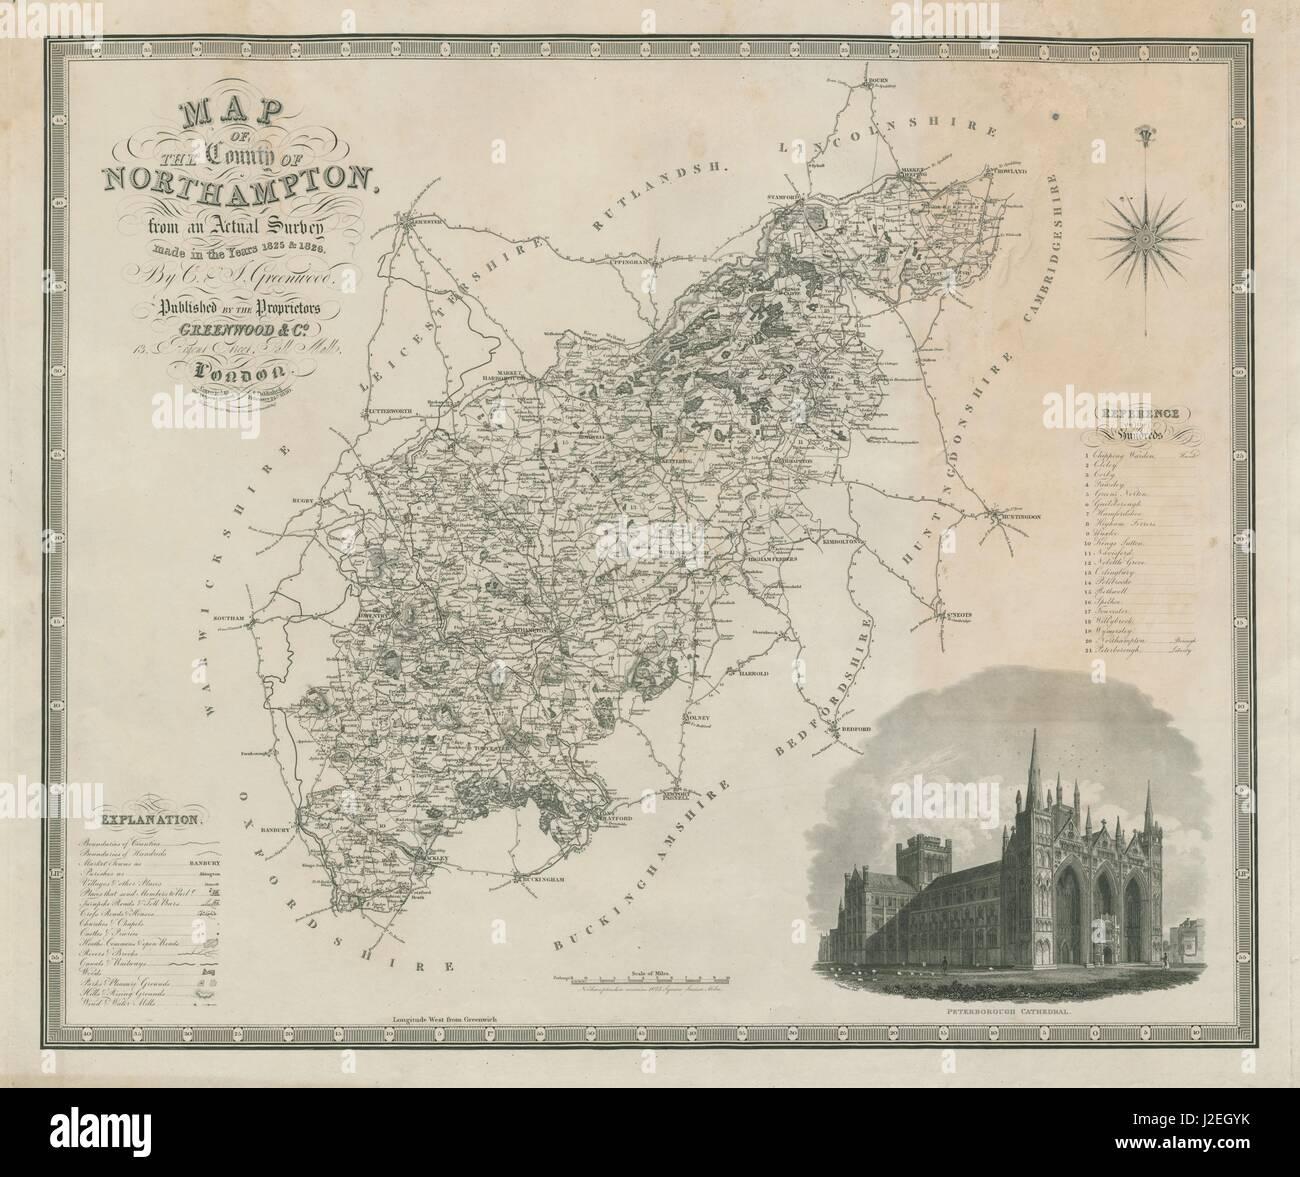 Map of the county of Northampton Northamptonshire GREENWOOD 75x60cm